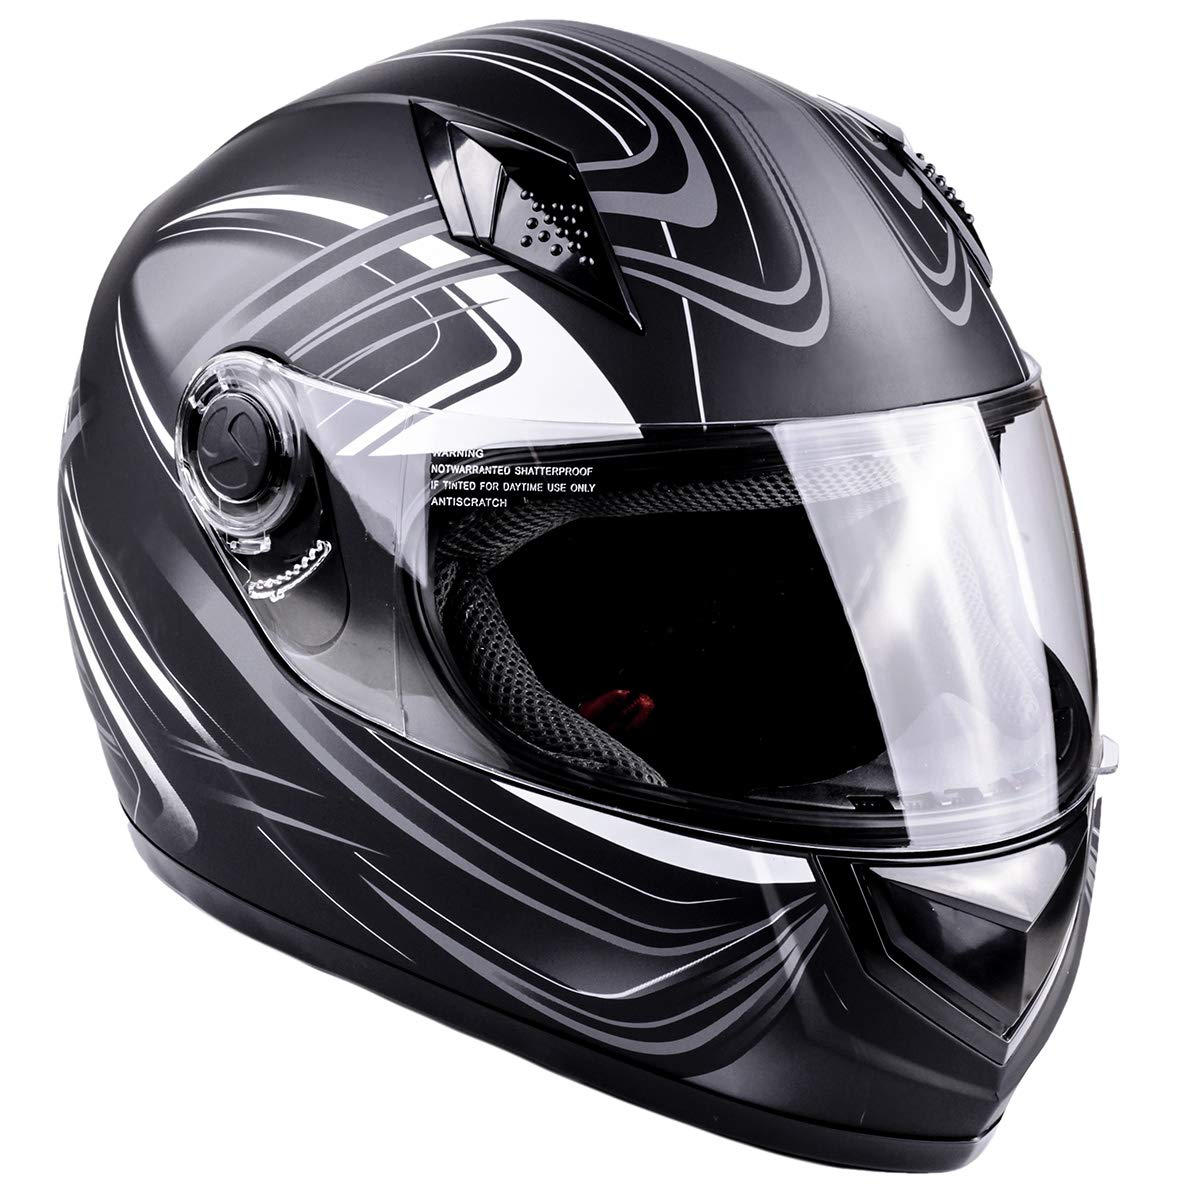 Typhoon Adult Full Face Motorcycle Helmet DOT - SAME DAY SHIPPING (Matte Grey, XXXL)